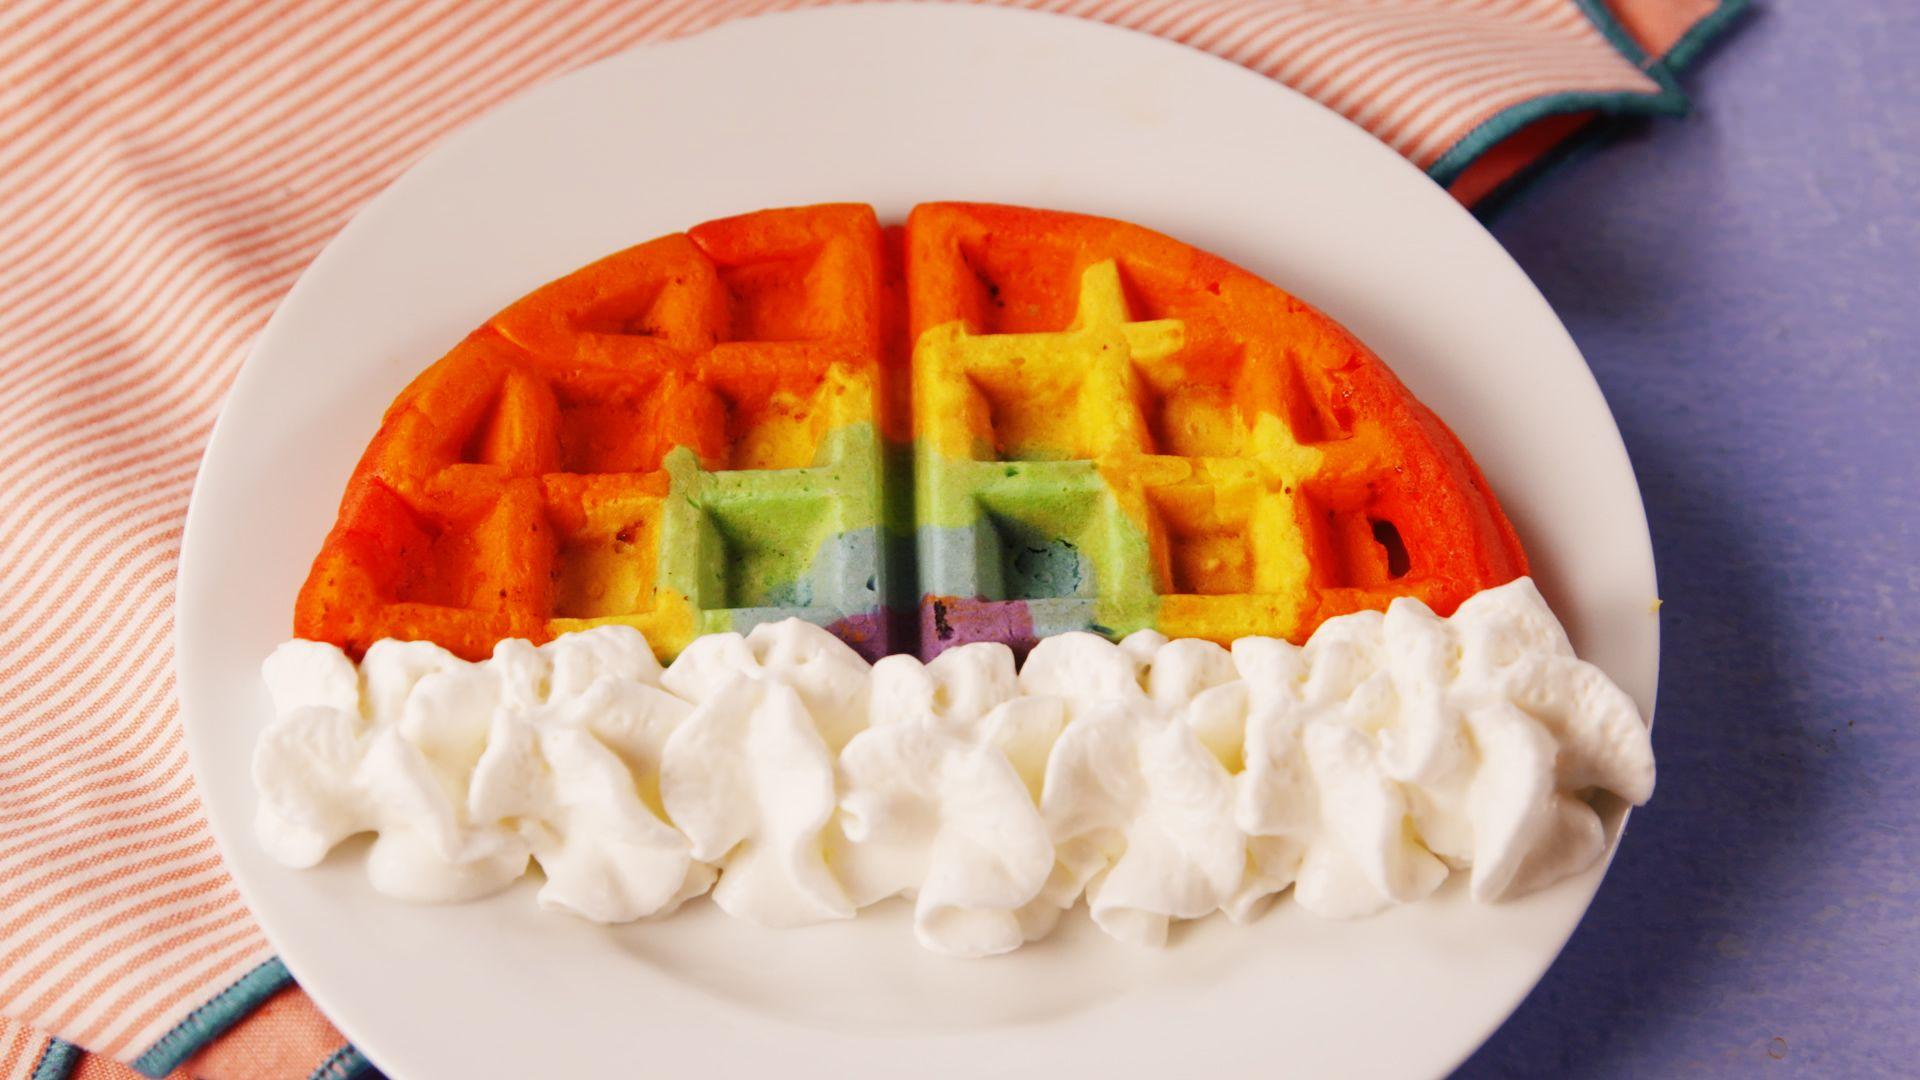 best rainbow waffle recipe how to make rainbow waffles